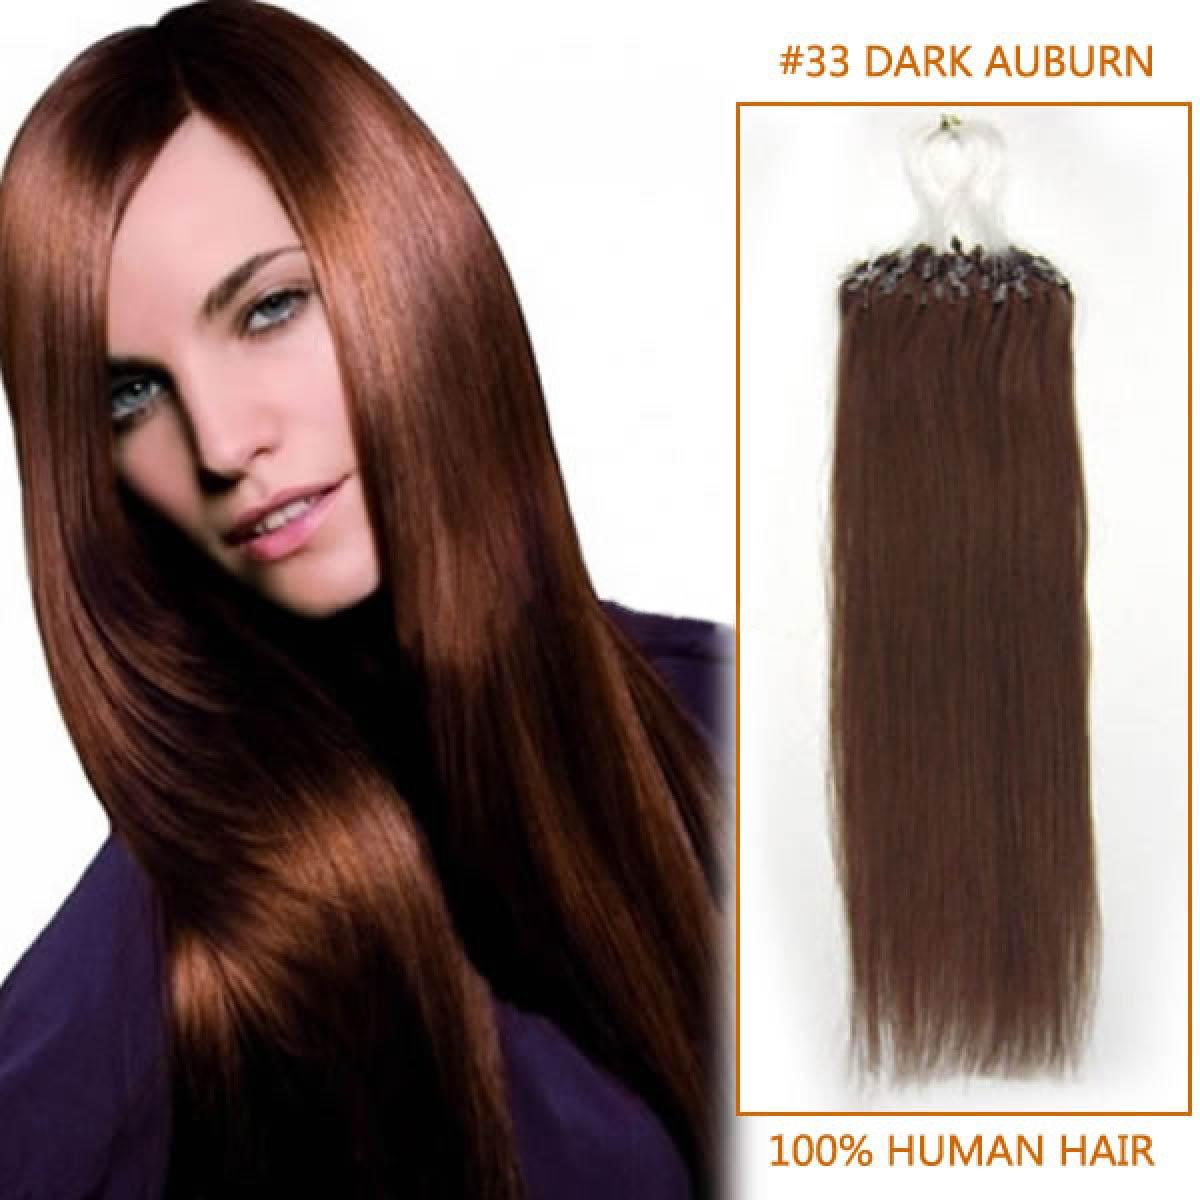 34 Inch 33 Dark Auburn Micro Loop Human Hair Extensions 100s 130g